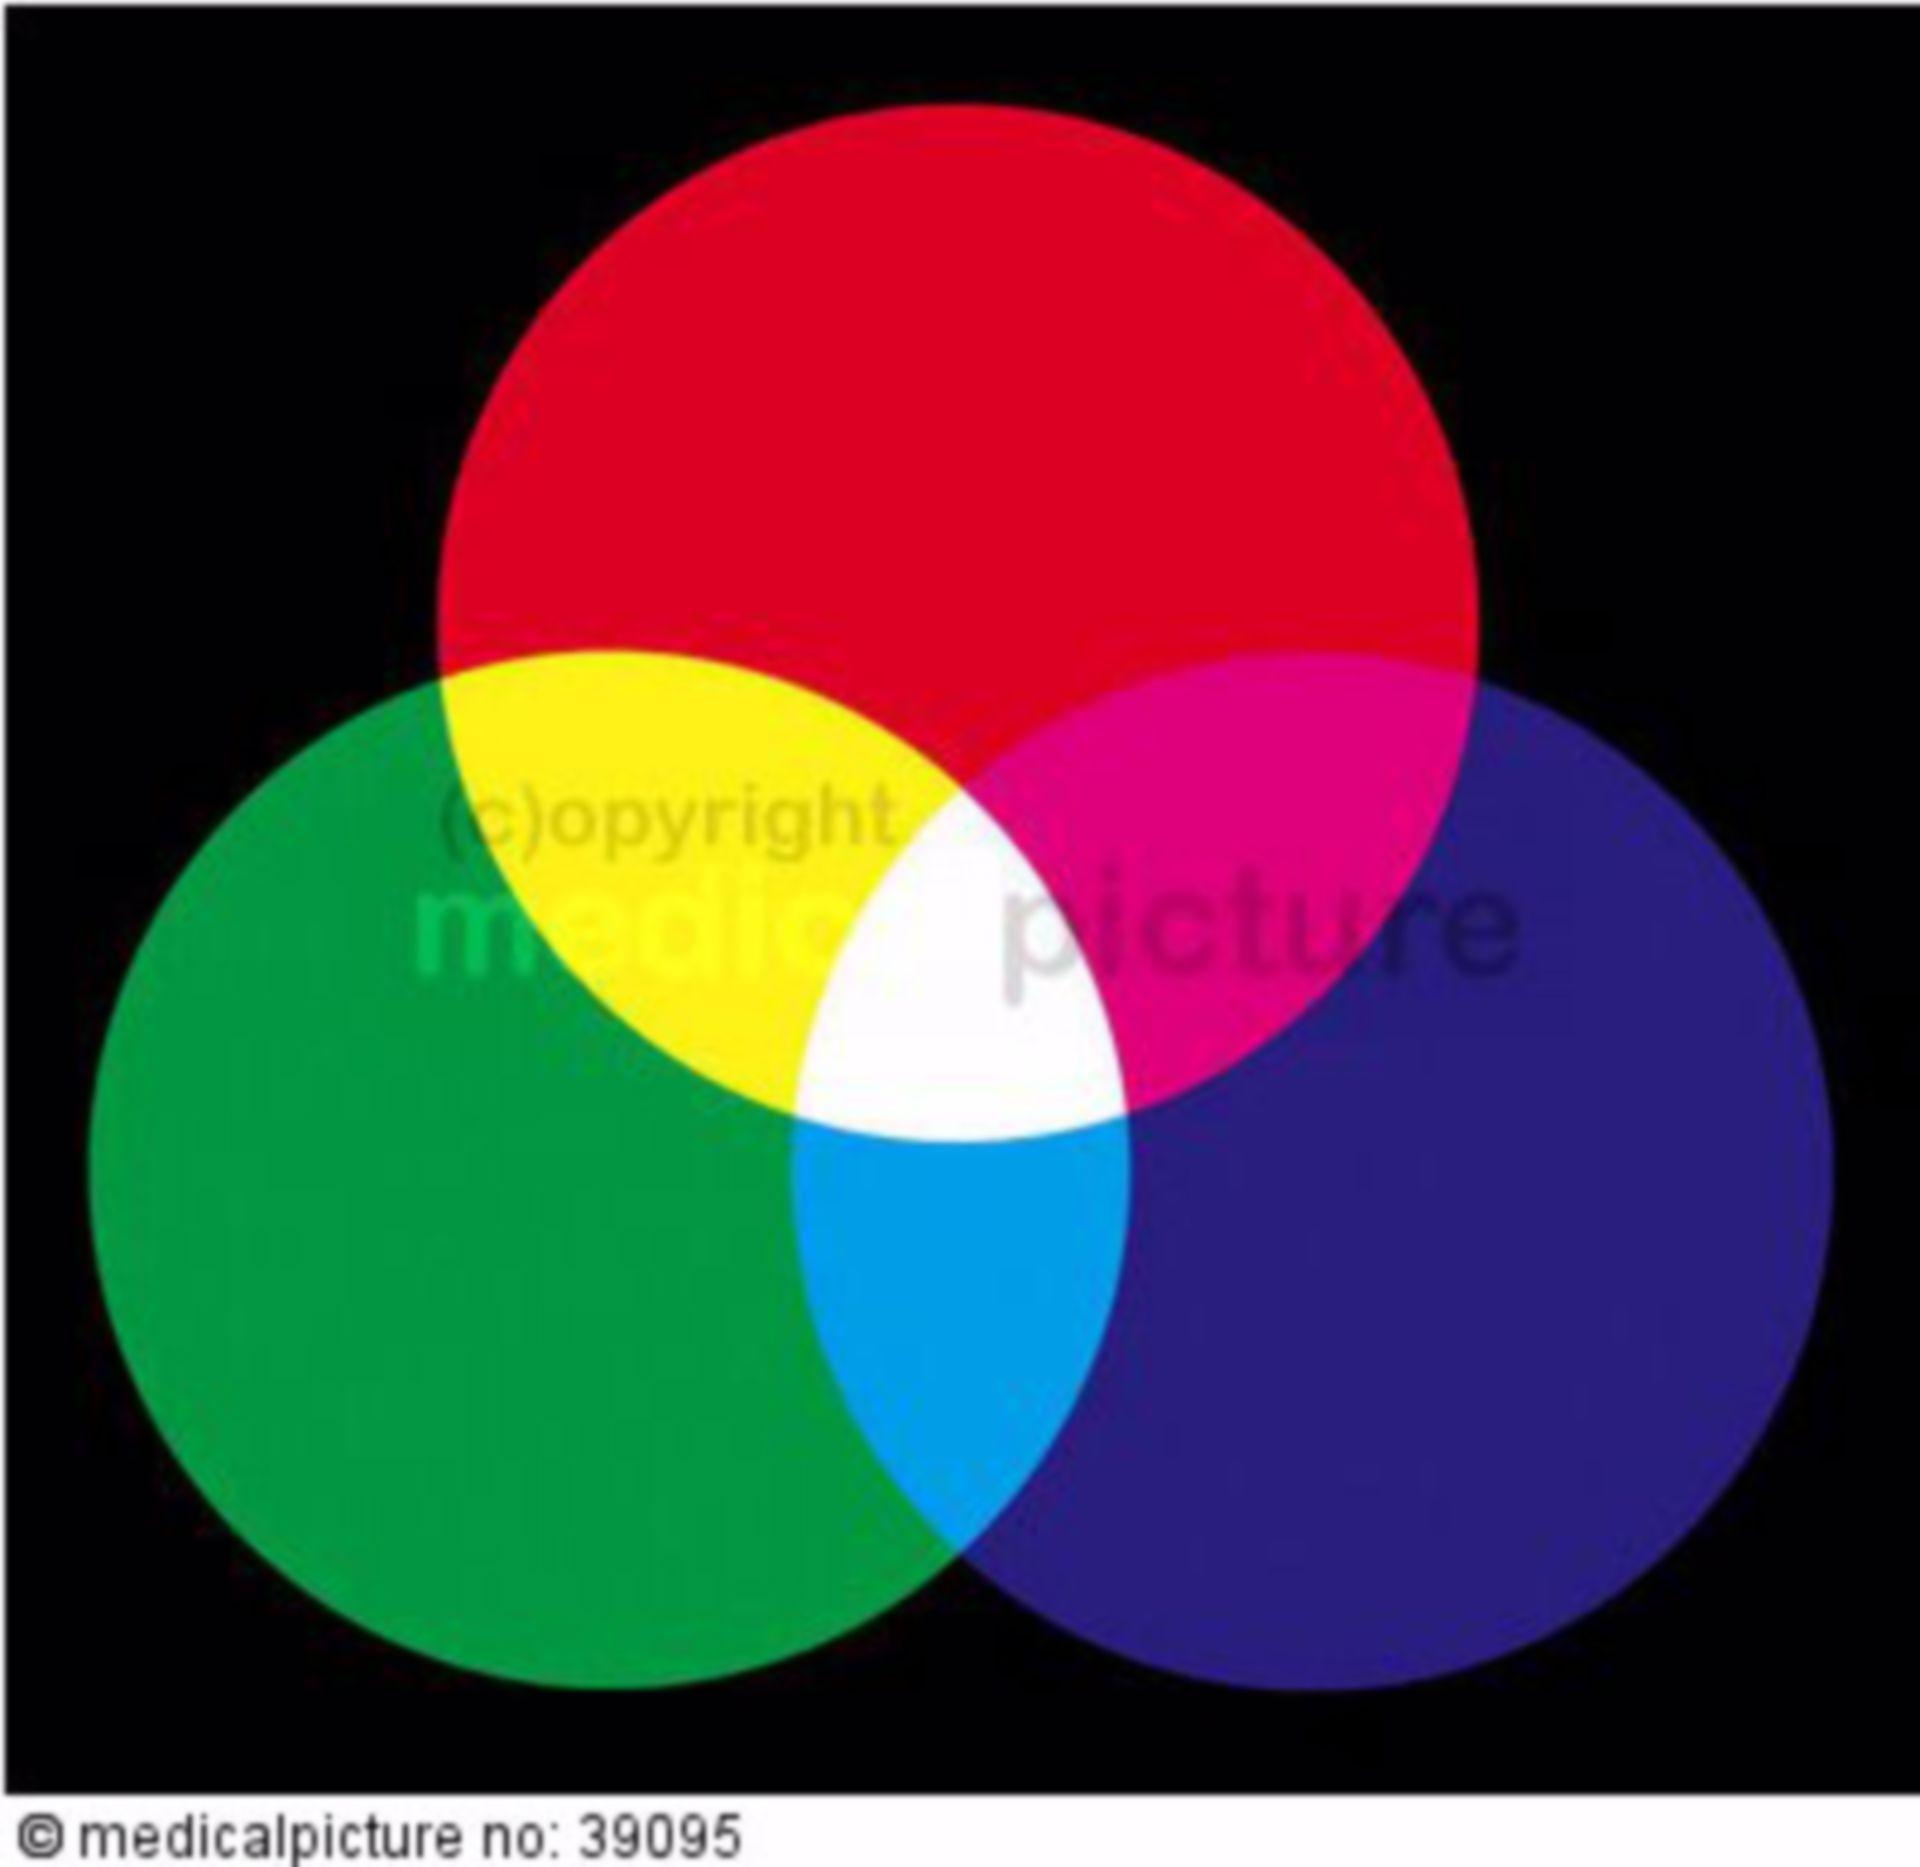 Additive color mixing, color diagram